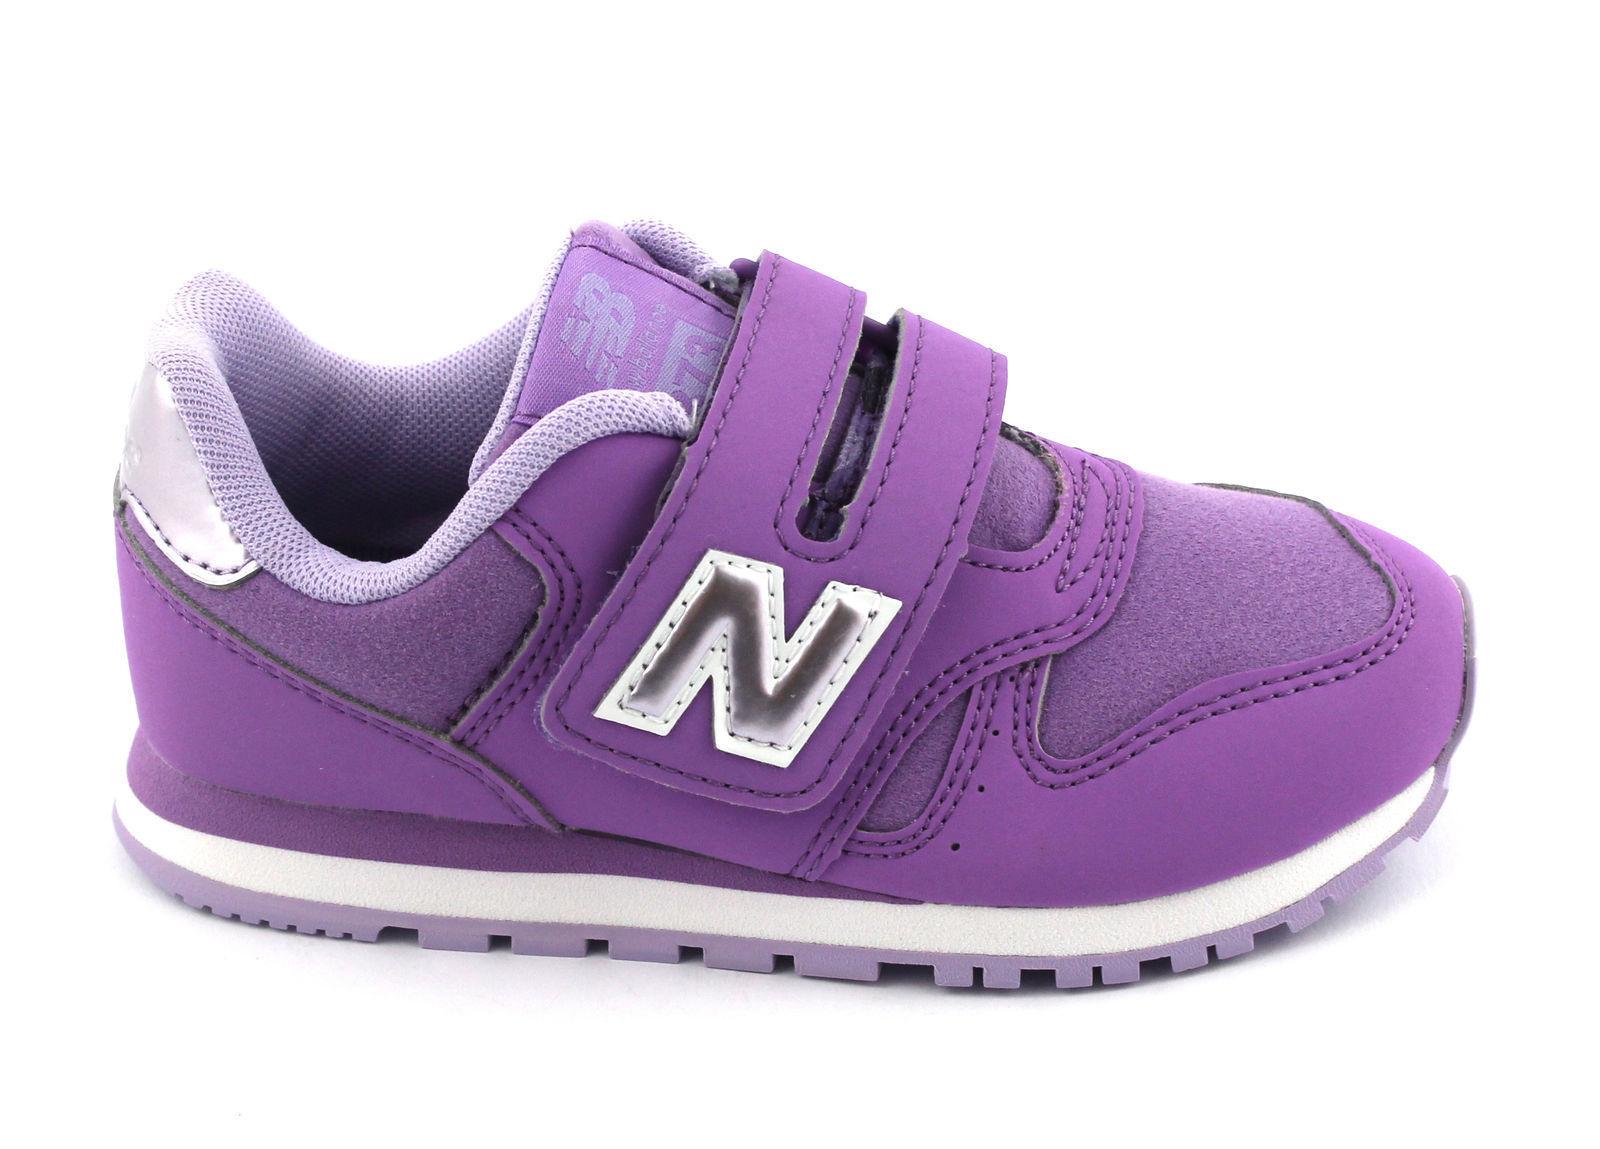 NEW BALANCE KV373 F3Y purple sneakers toddler UK 5.5 £12.94 delivered @ karaokequeen1975 ebay